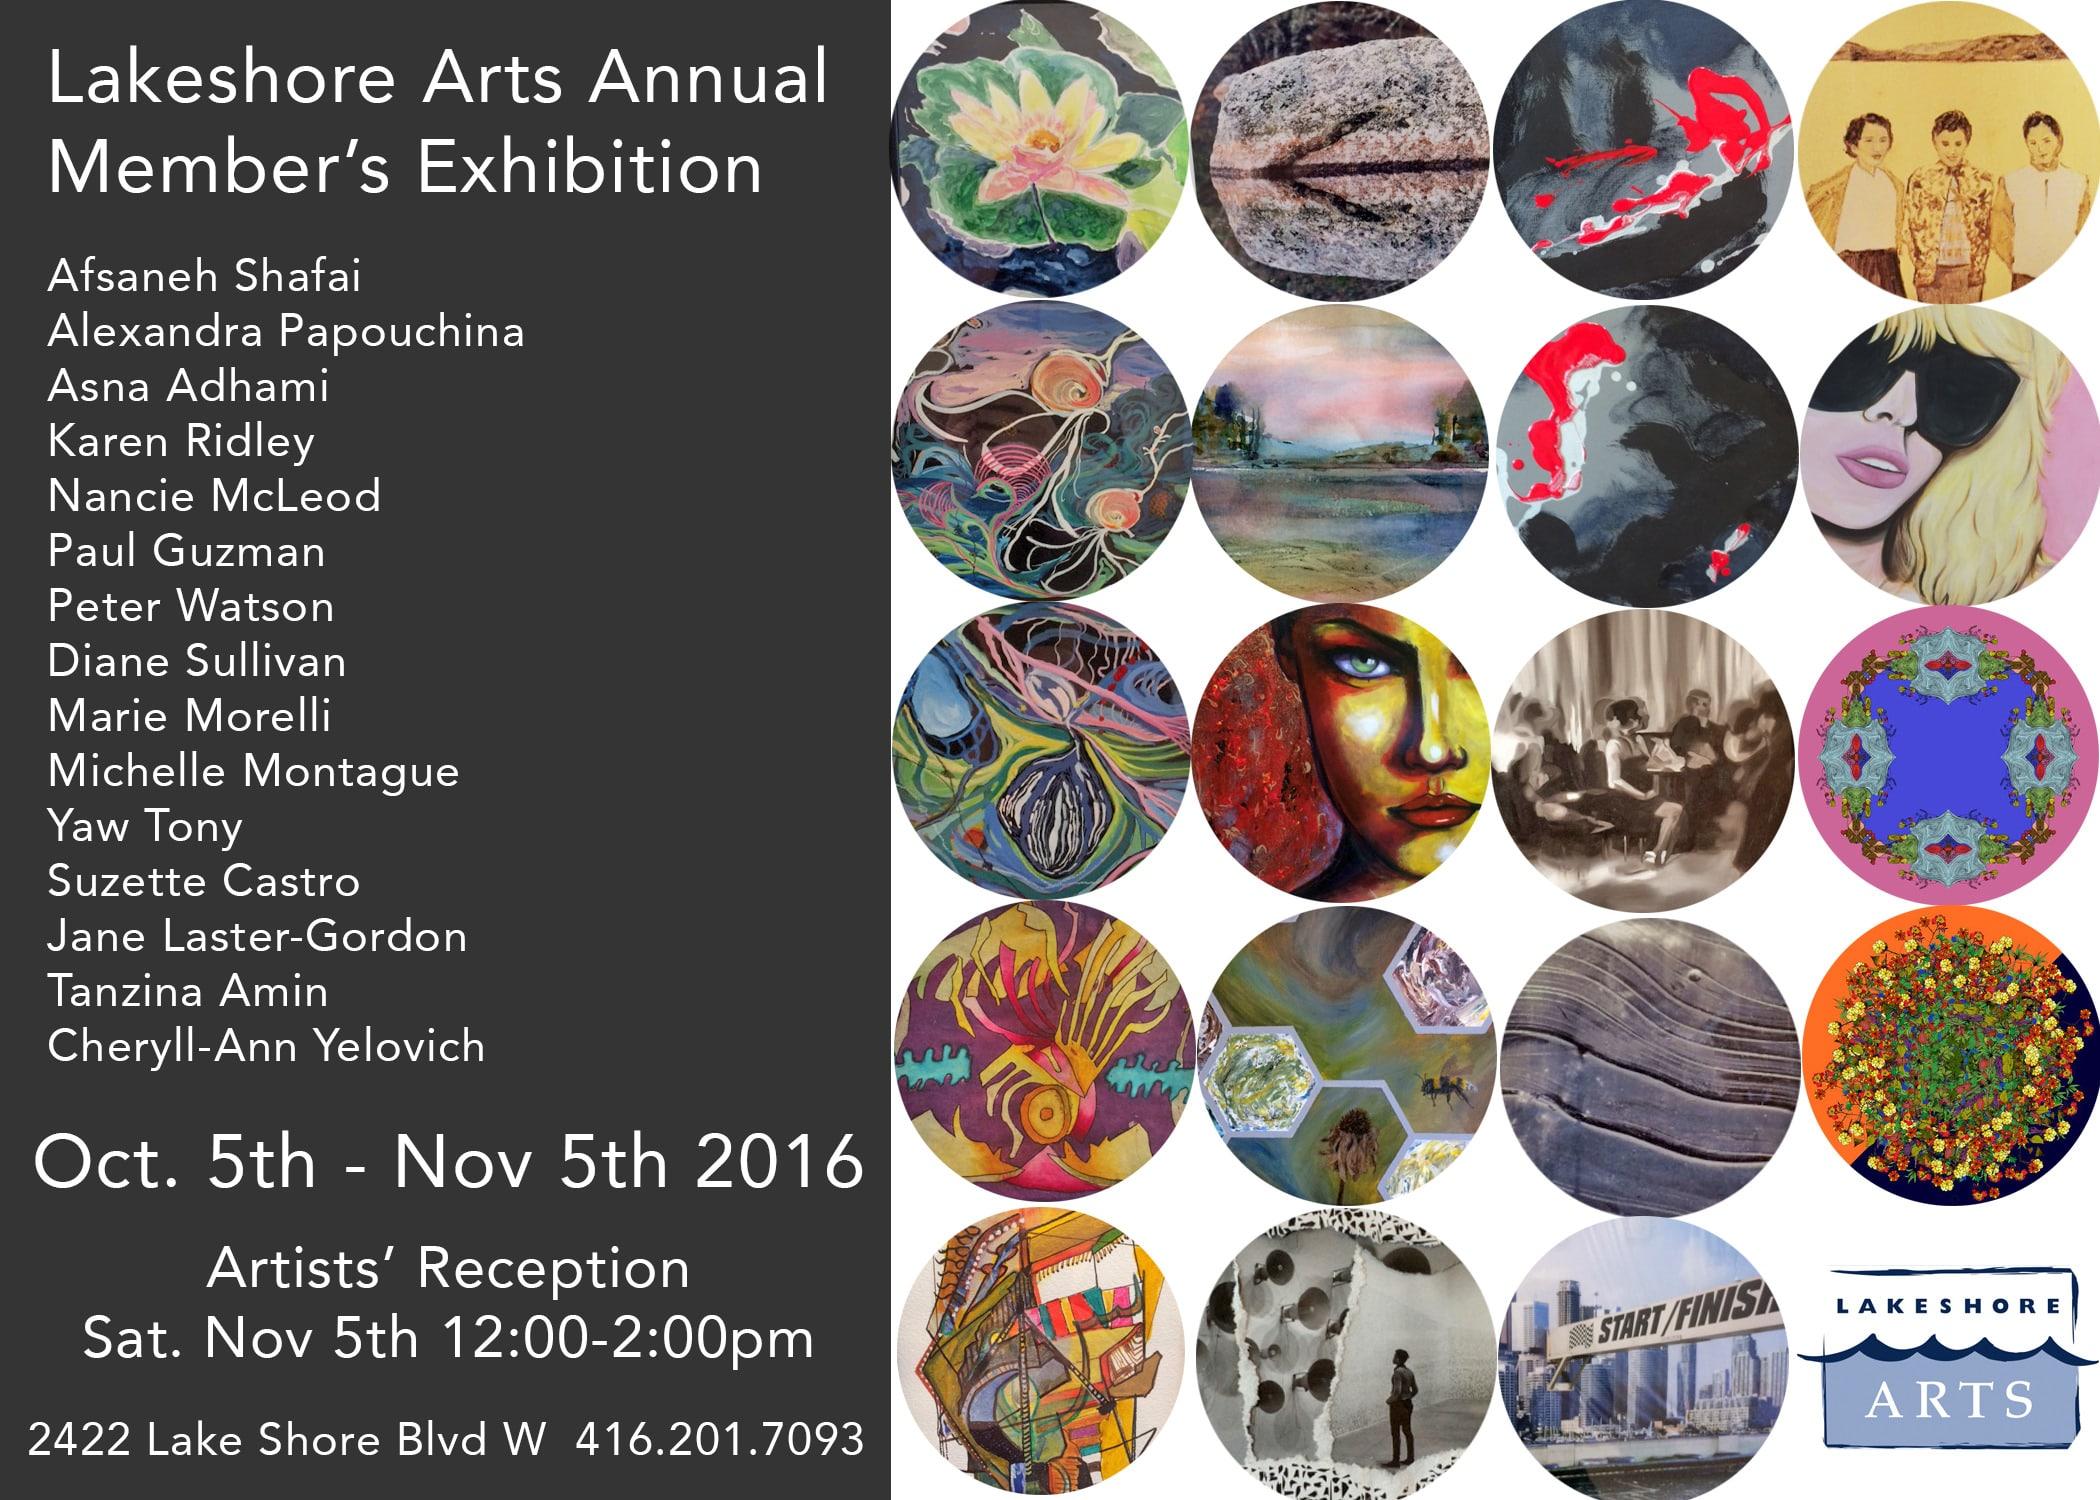 2016 Member's Exhibition